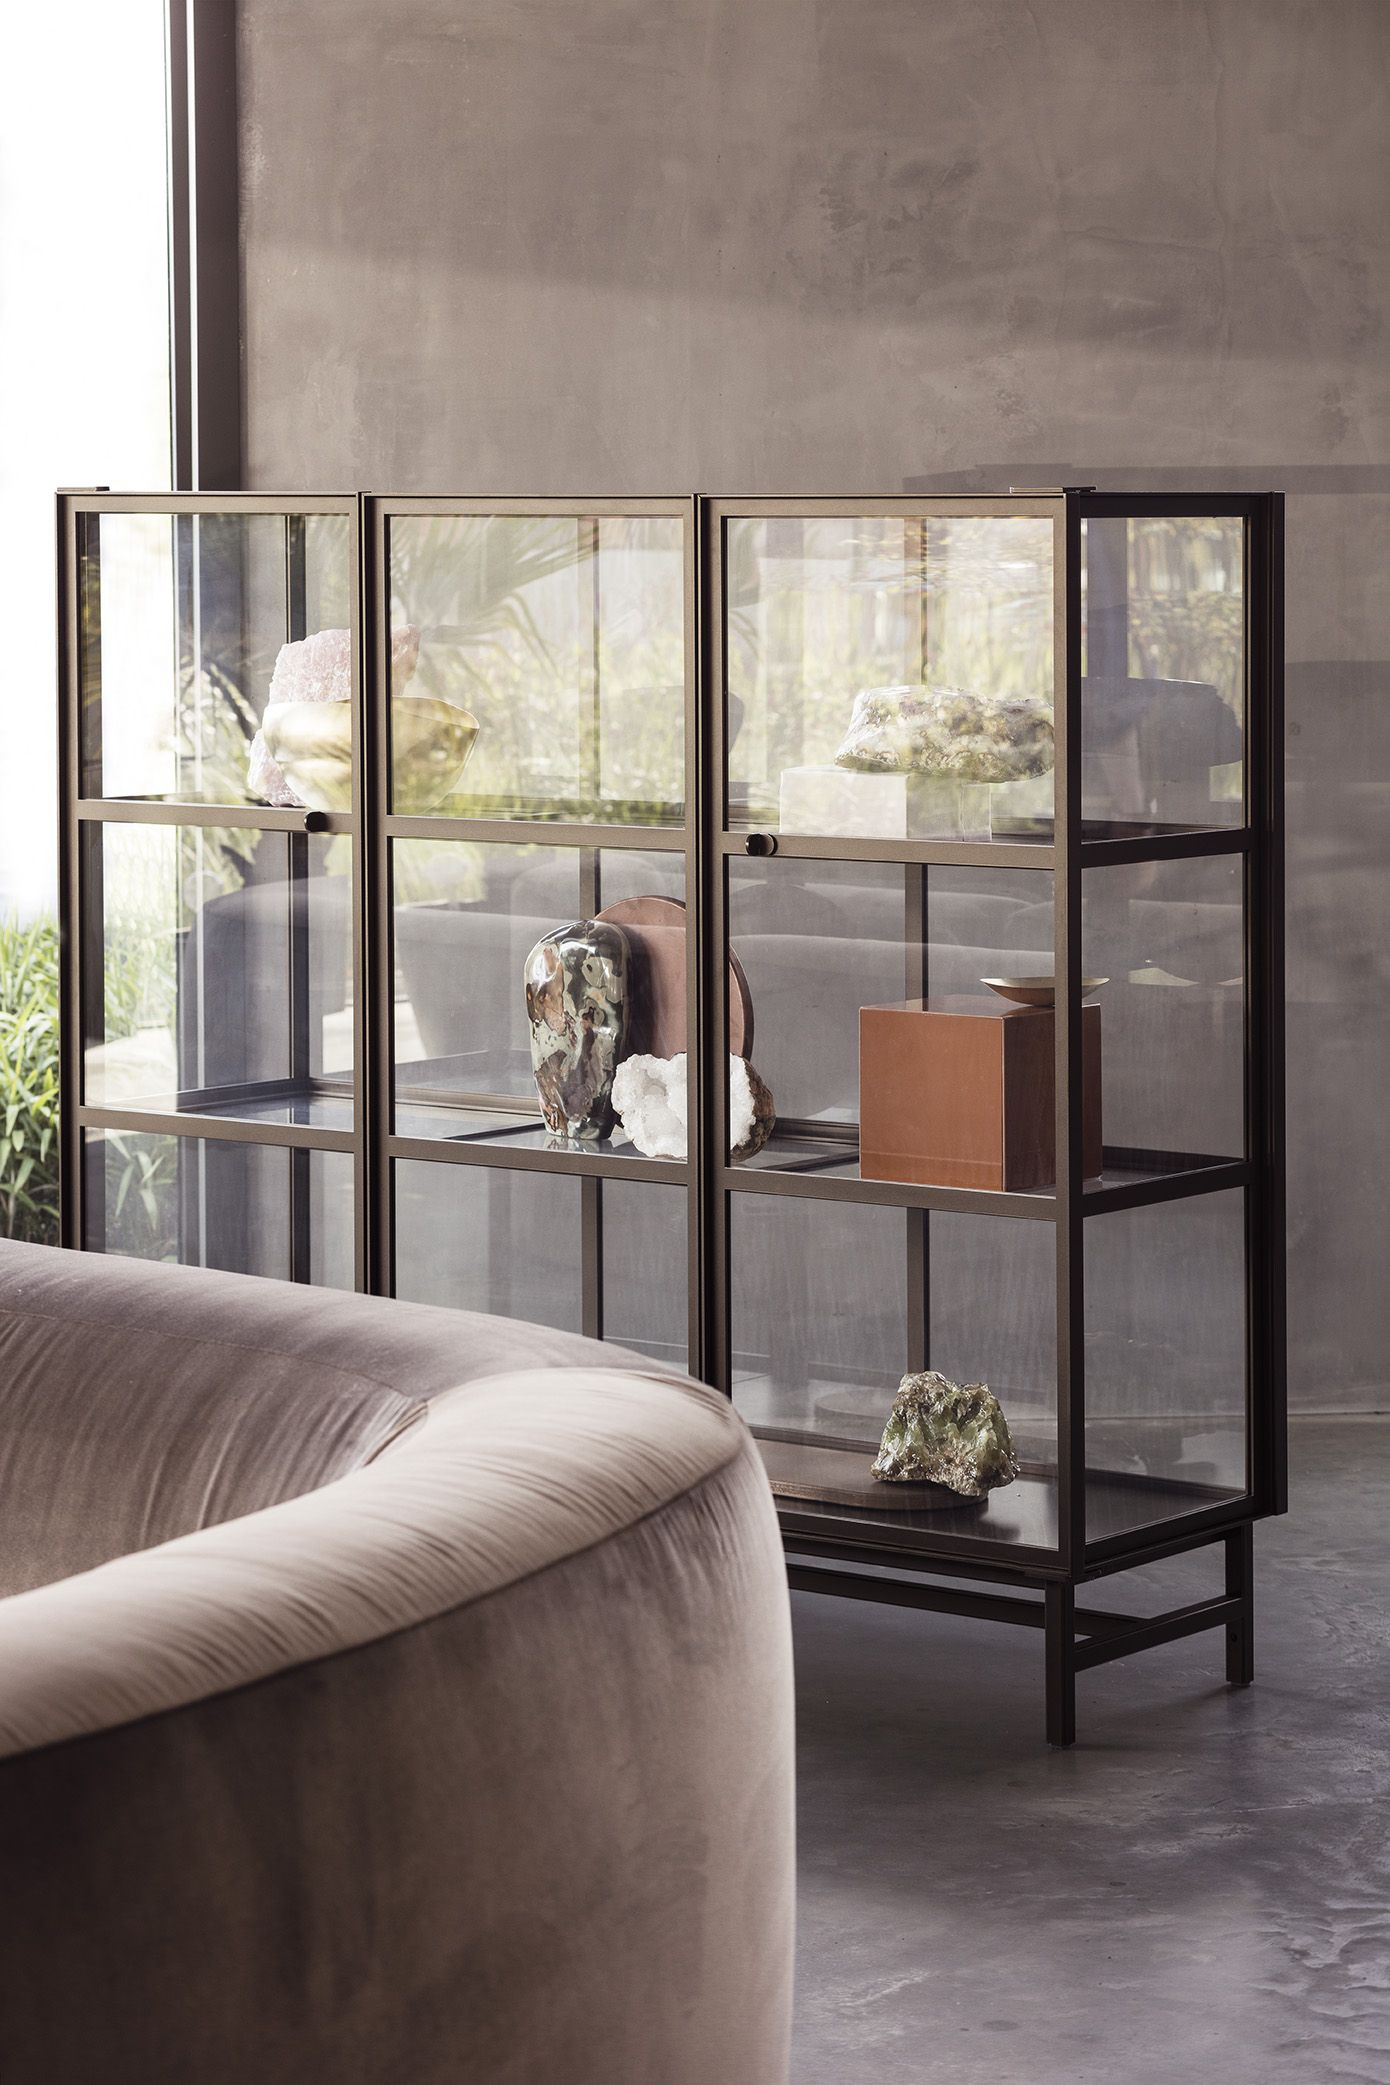 Steel FINN Cabinet, Round BO Sofa, Concrete Floor